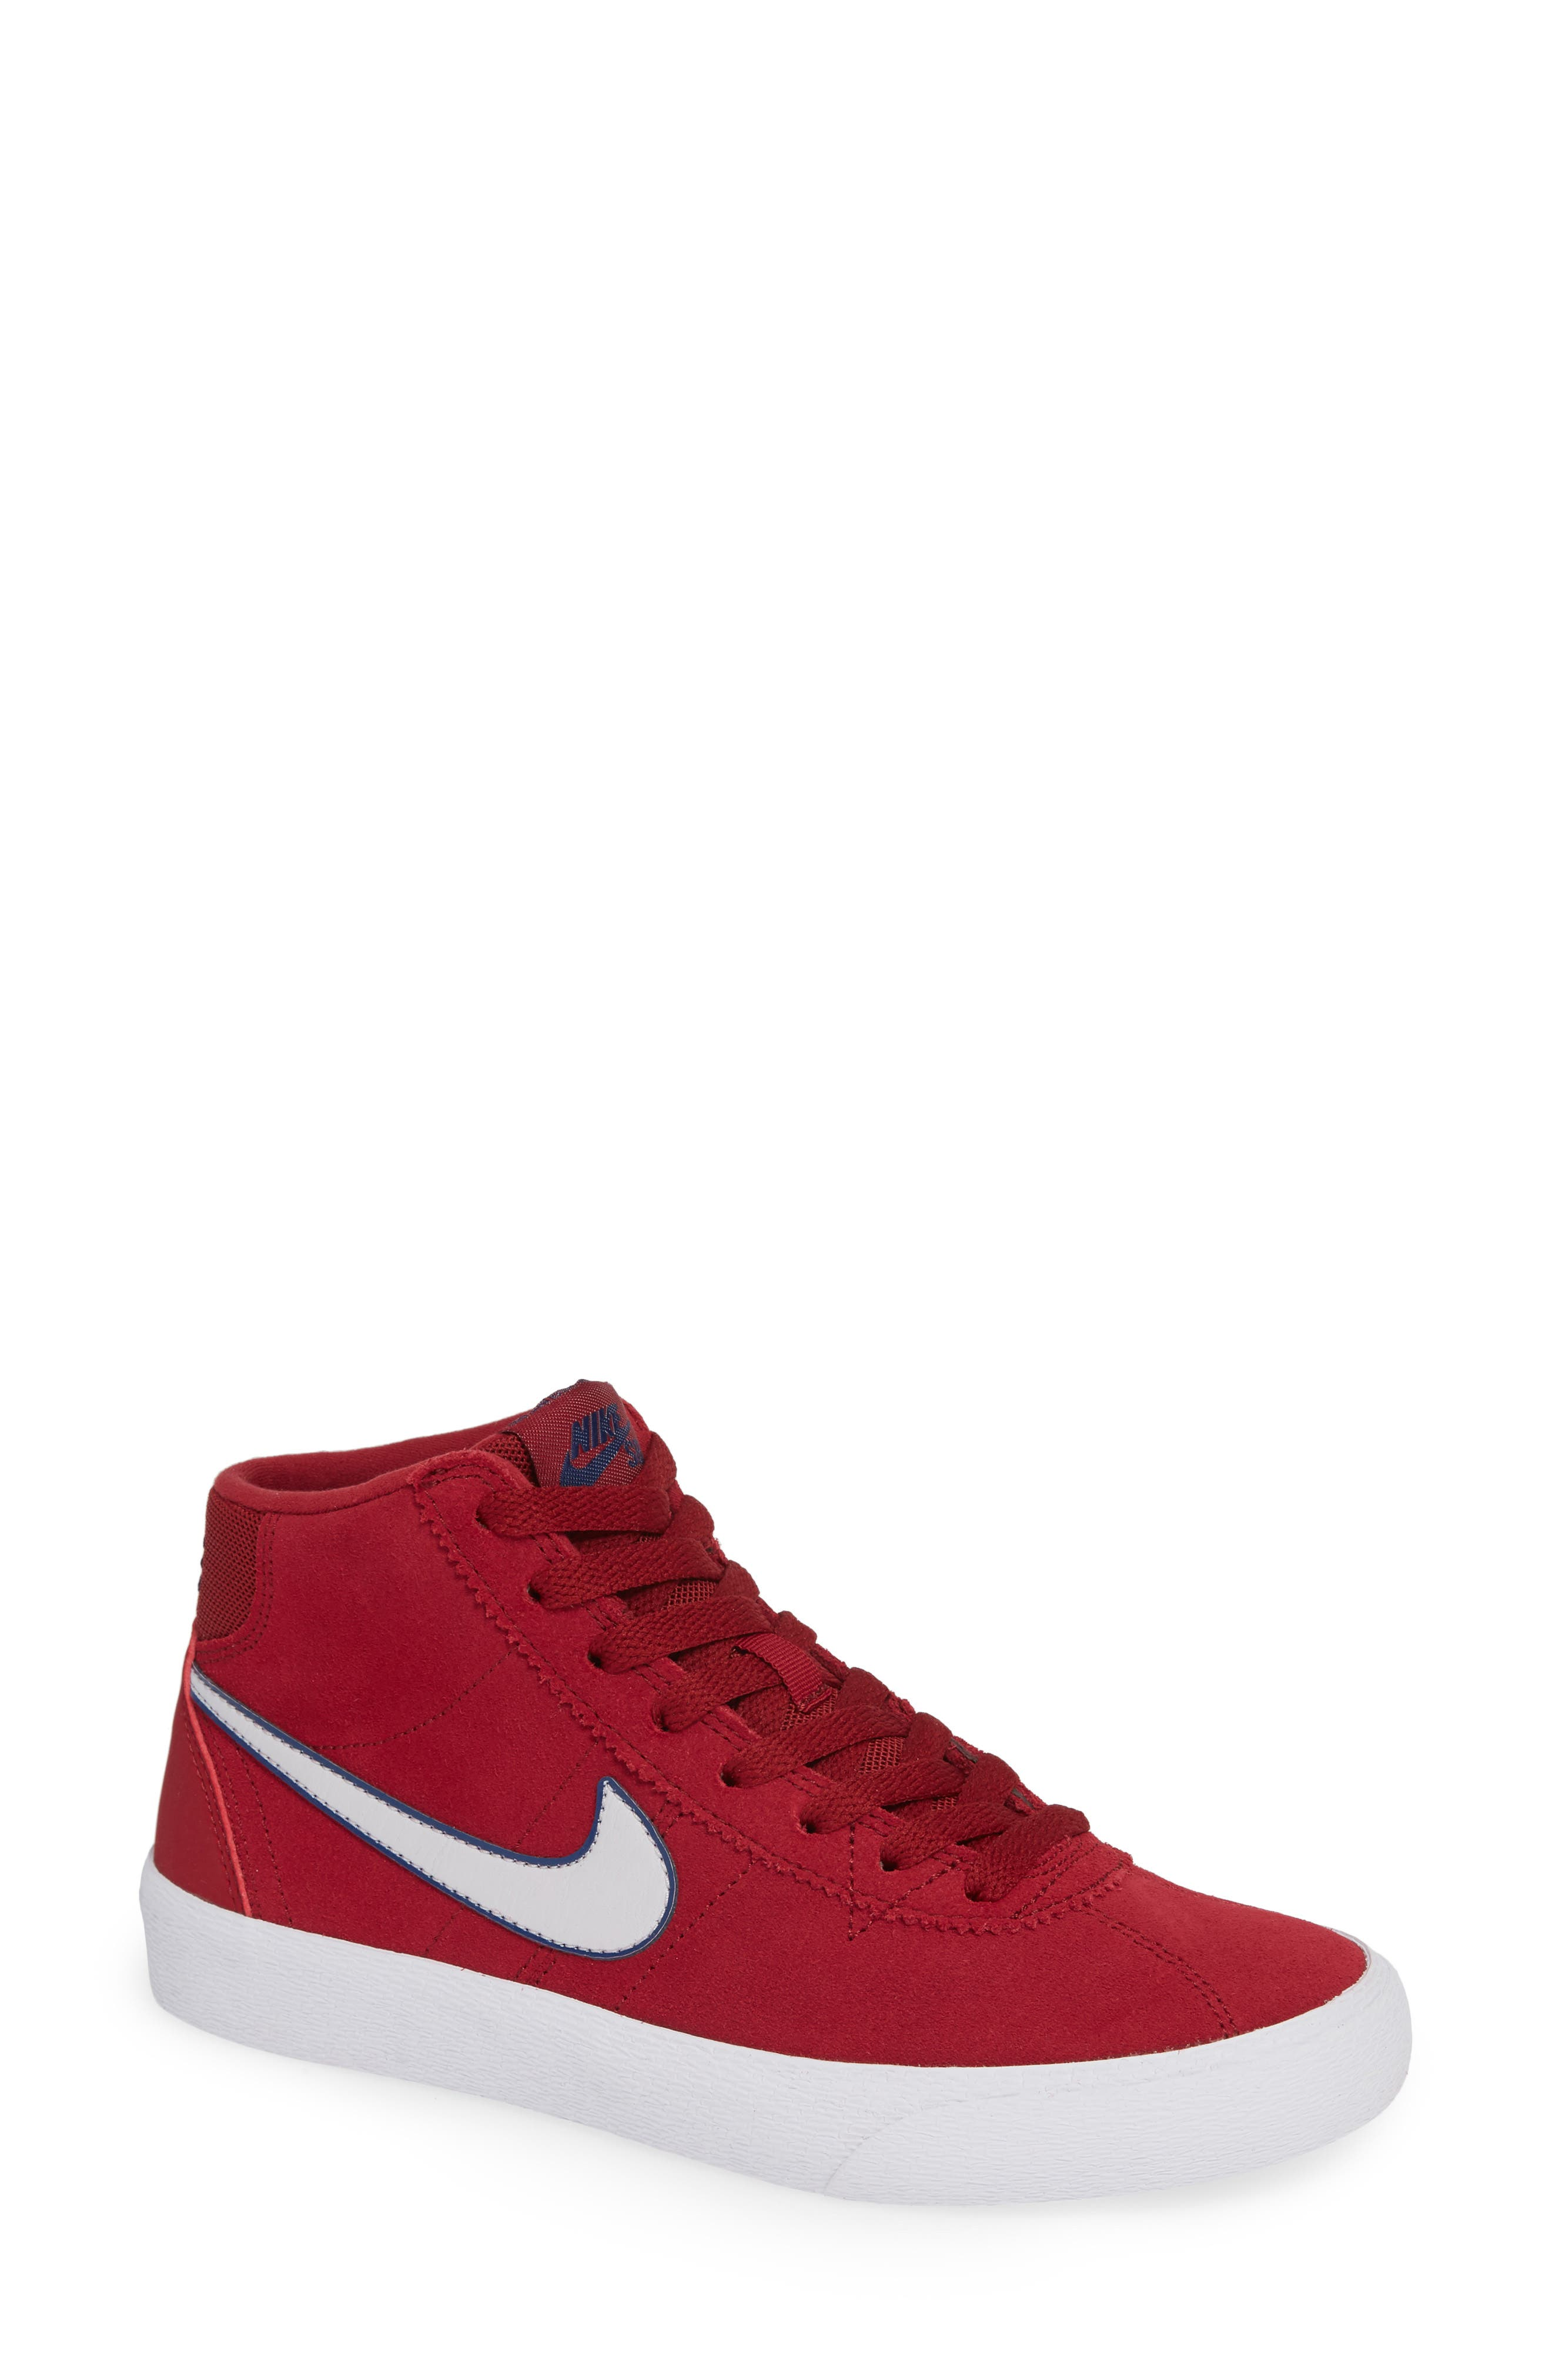 SB Bruin Hi Skateboarding Sneaker,                         Main,                         color, Red Crush/ Vast Grey/ White